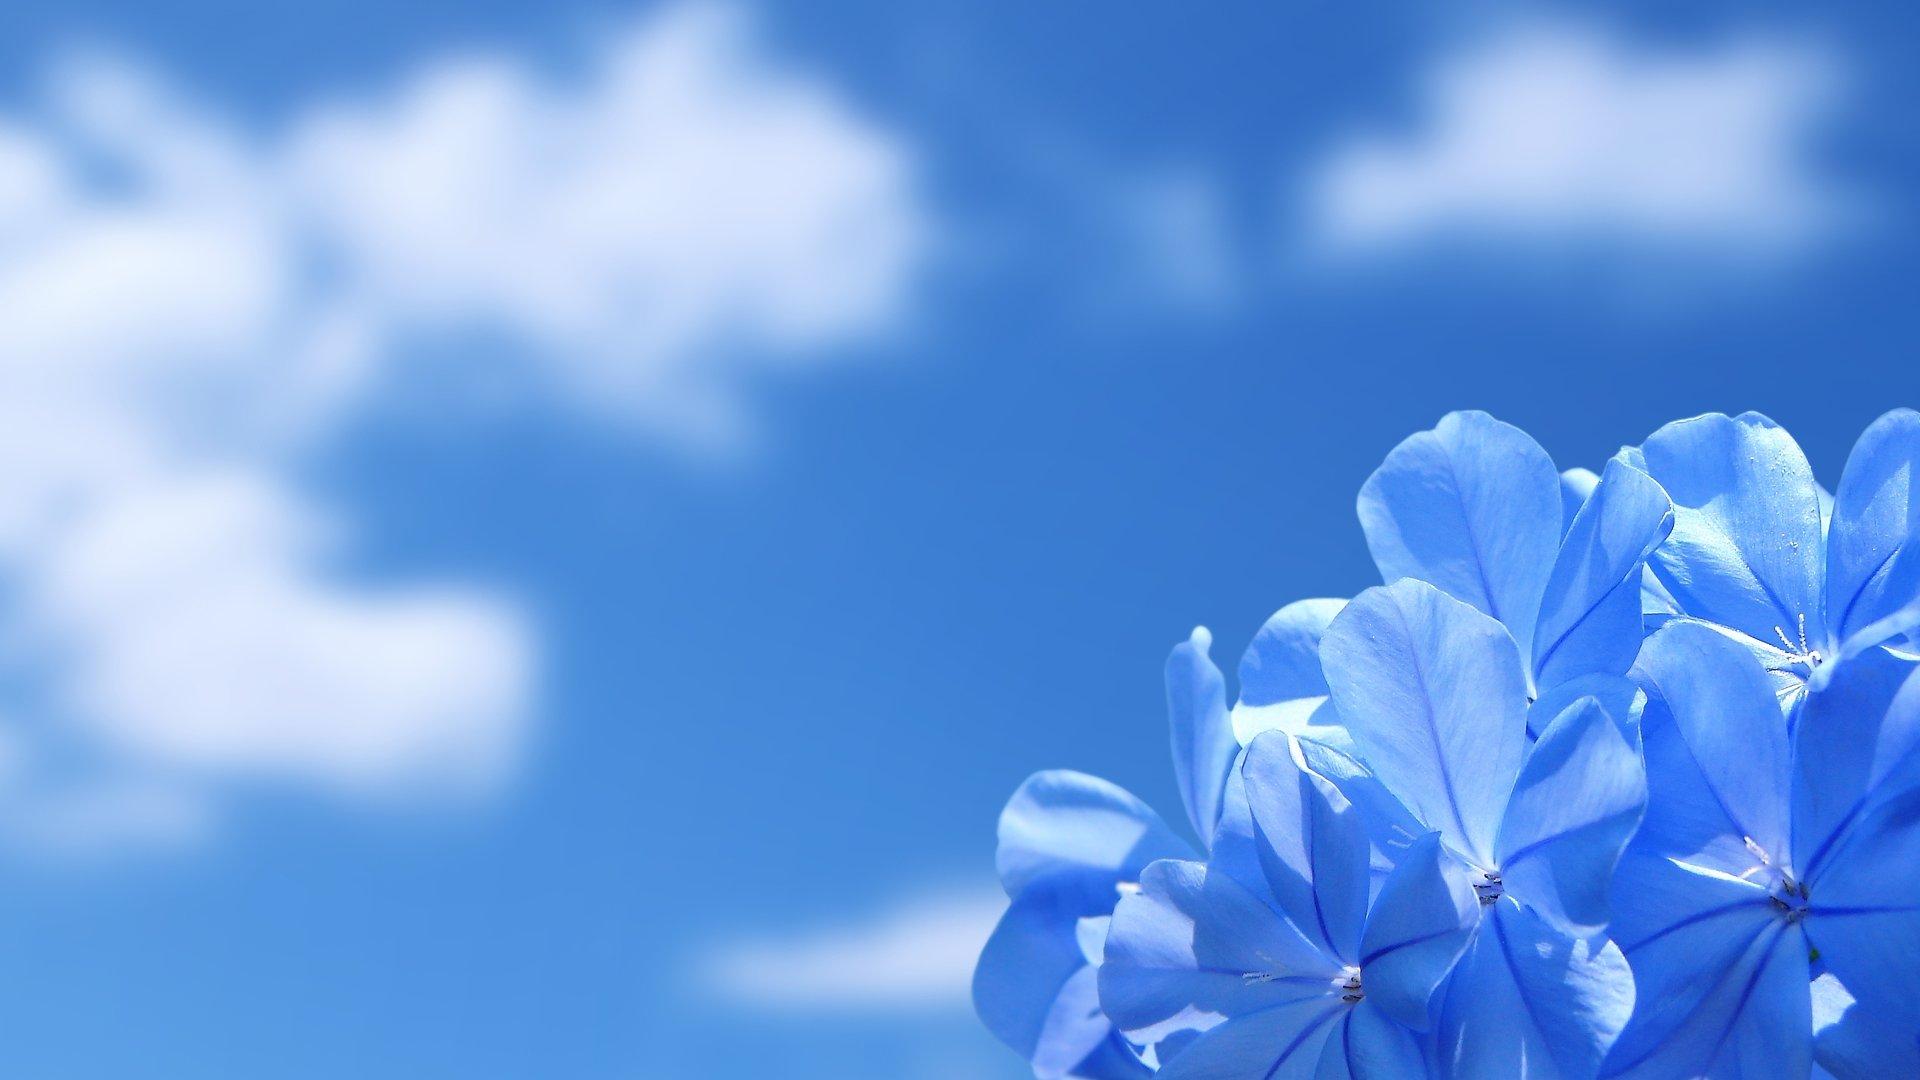 Desktop Wallpaper Of Flowers Full Size 1920x1080